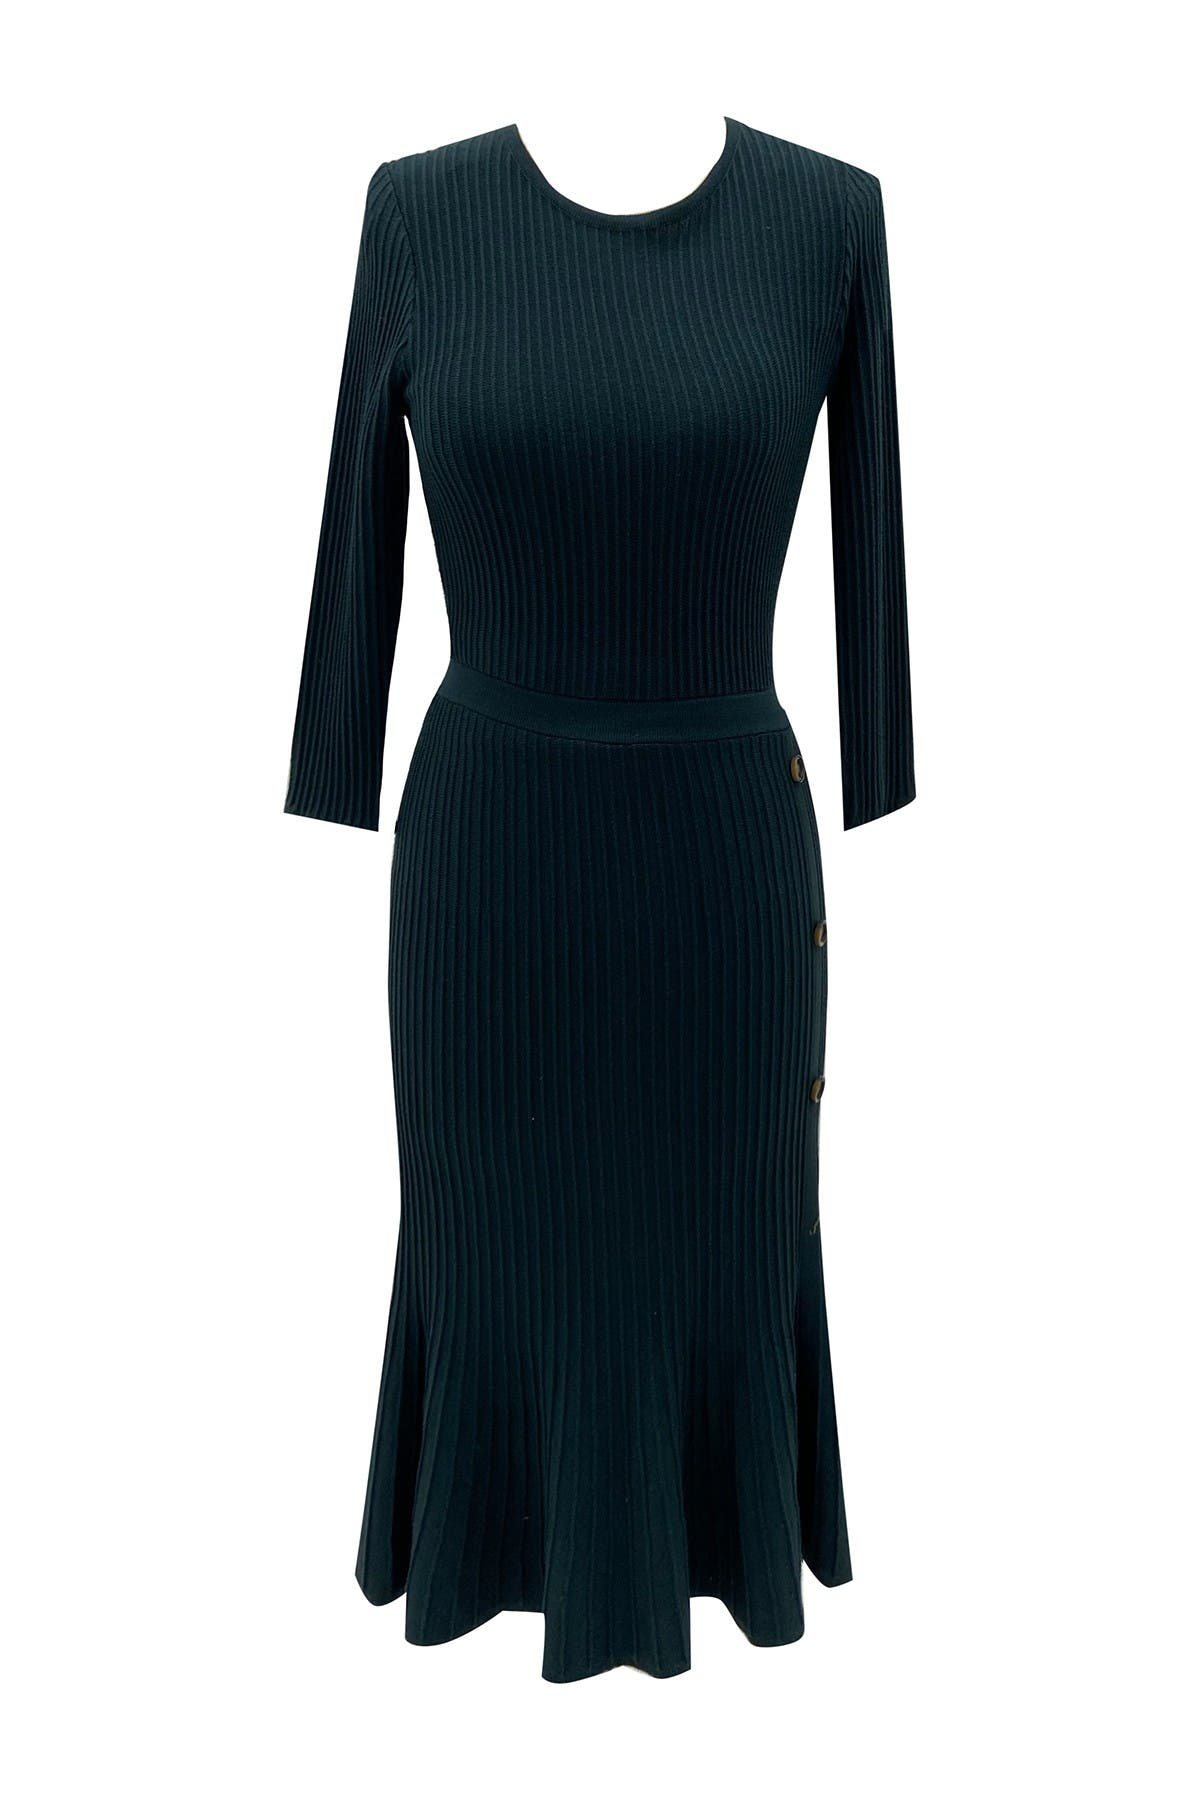 Image of Sandra Darren 3/4 Sleeve Sweater Dress